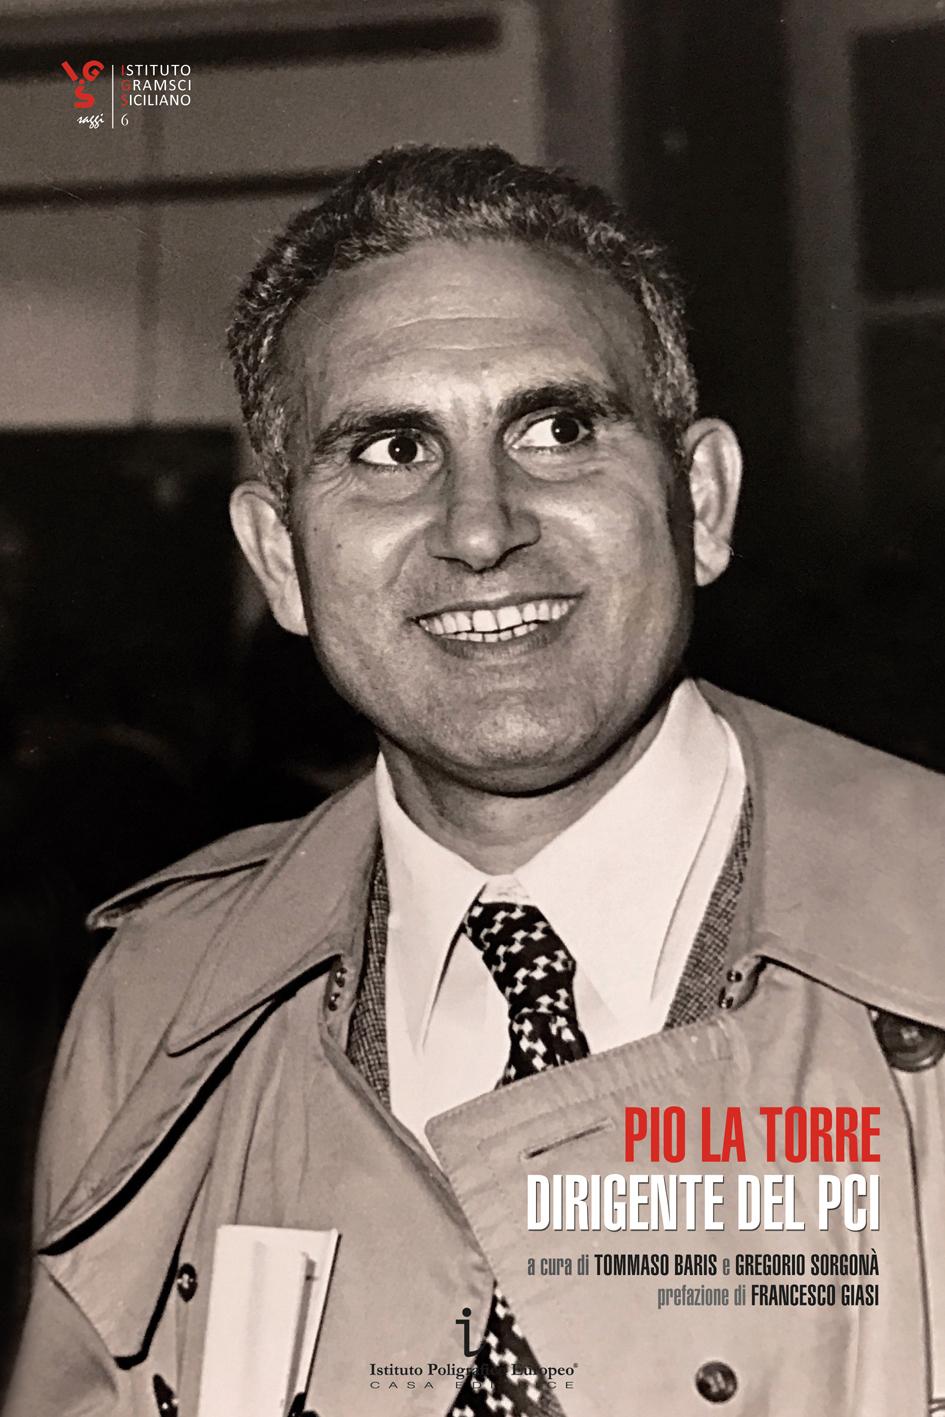 Pio La Torre Dirigente Del PCI